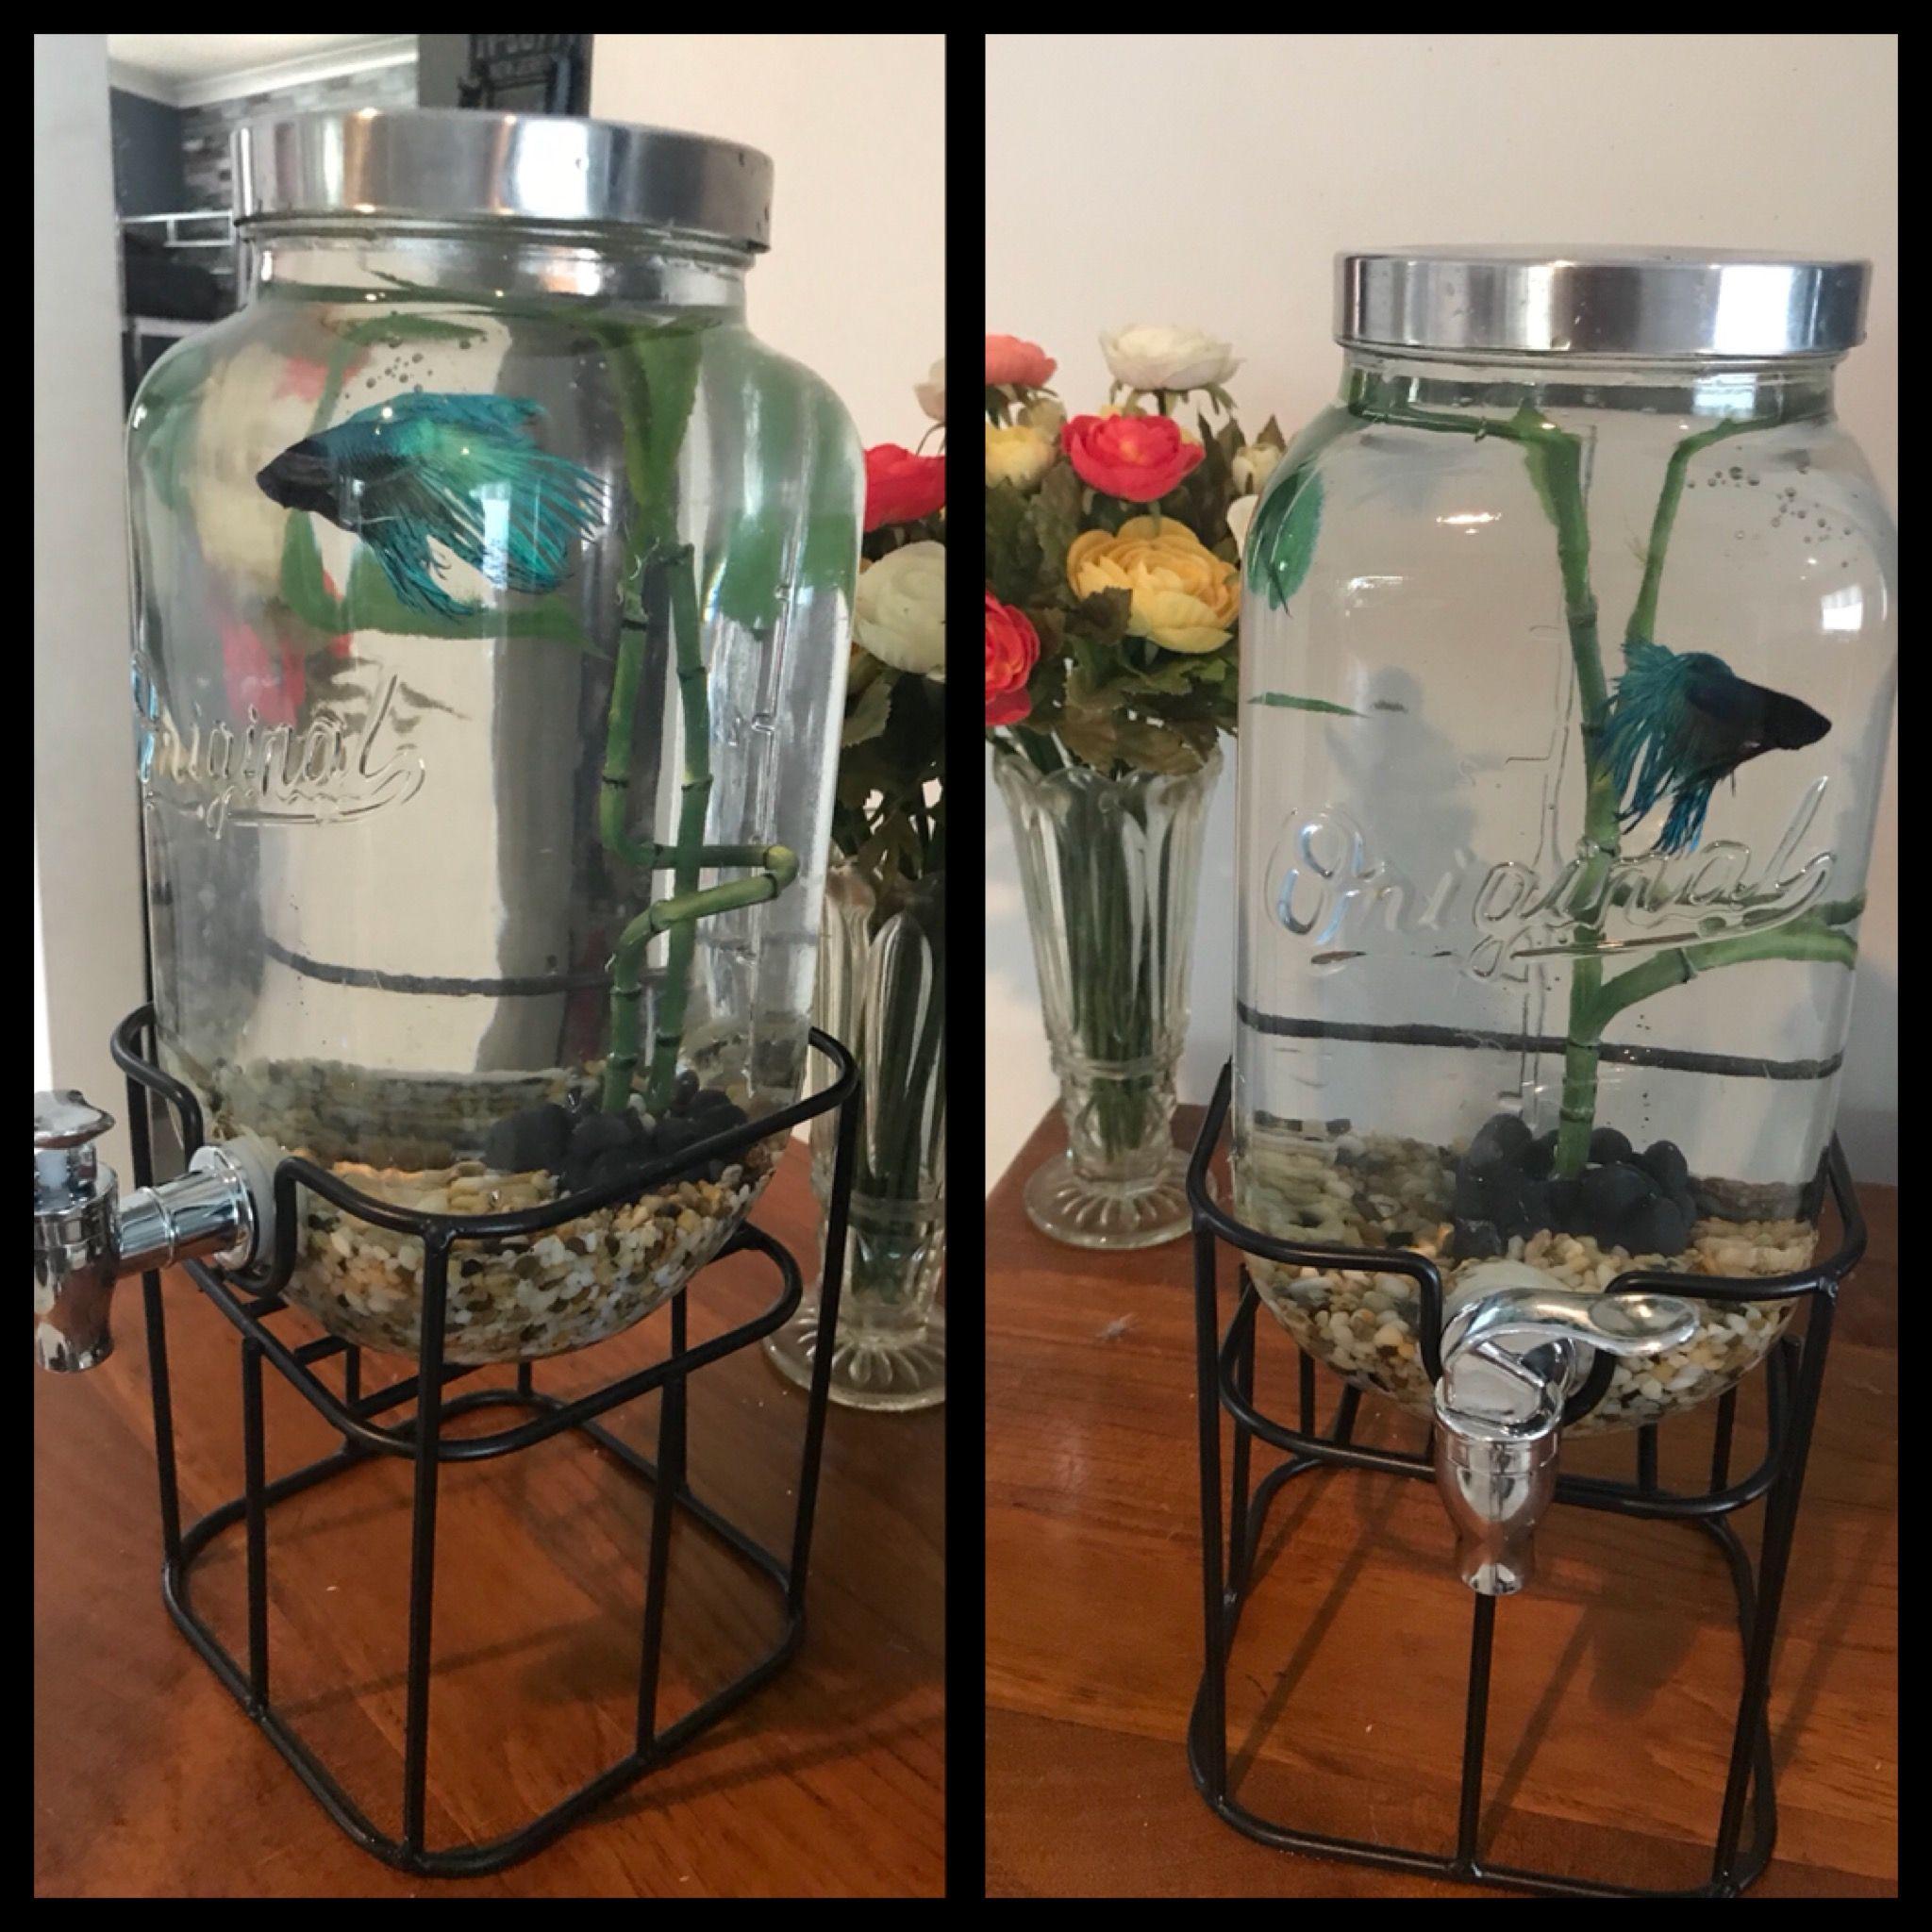 Siamese fighting fish betta glass jar tank set up natalieus work